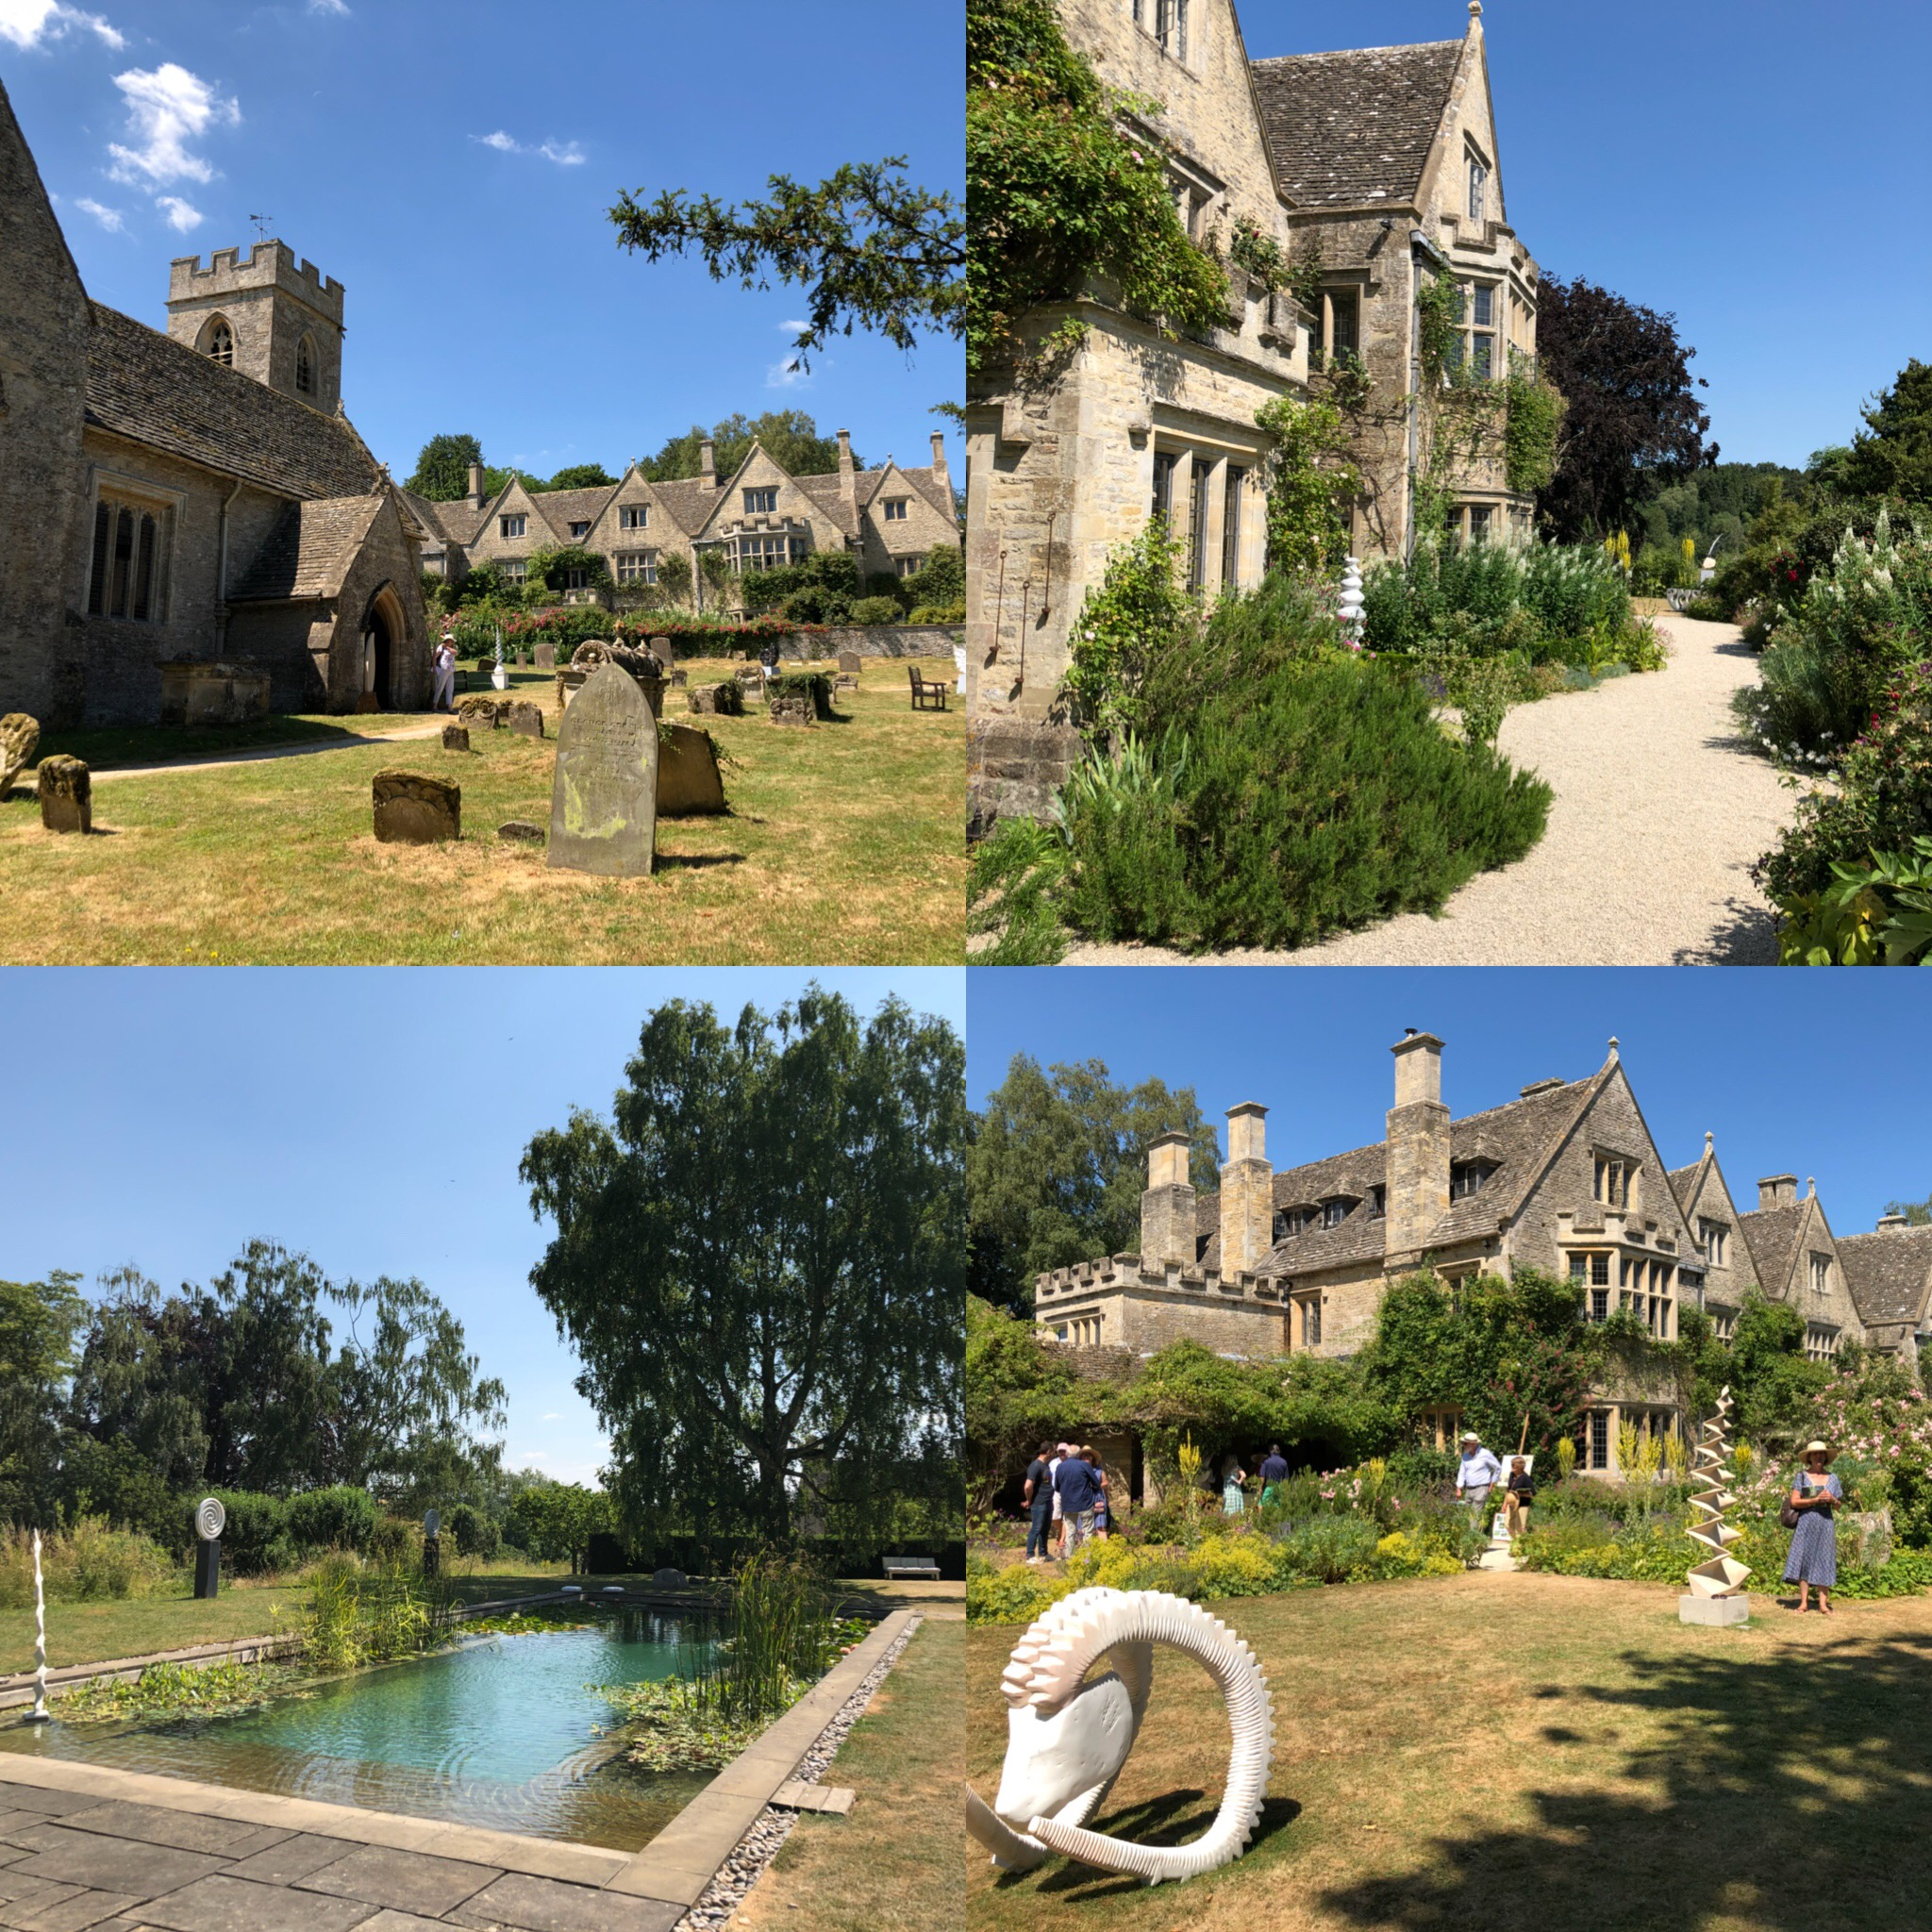 St Nicholas Church, Asthall And Asthall Manor Gardens